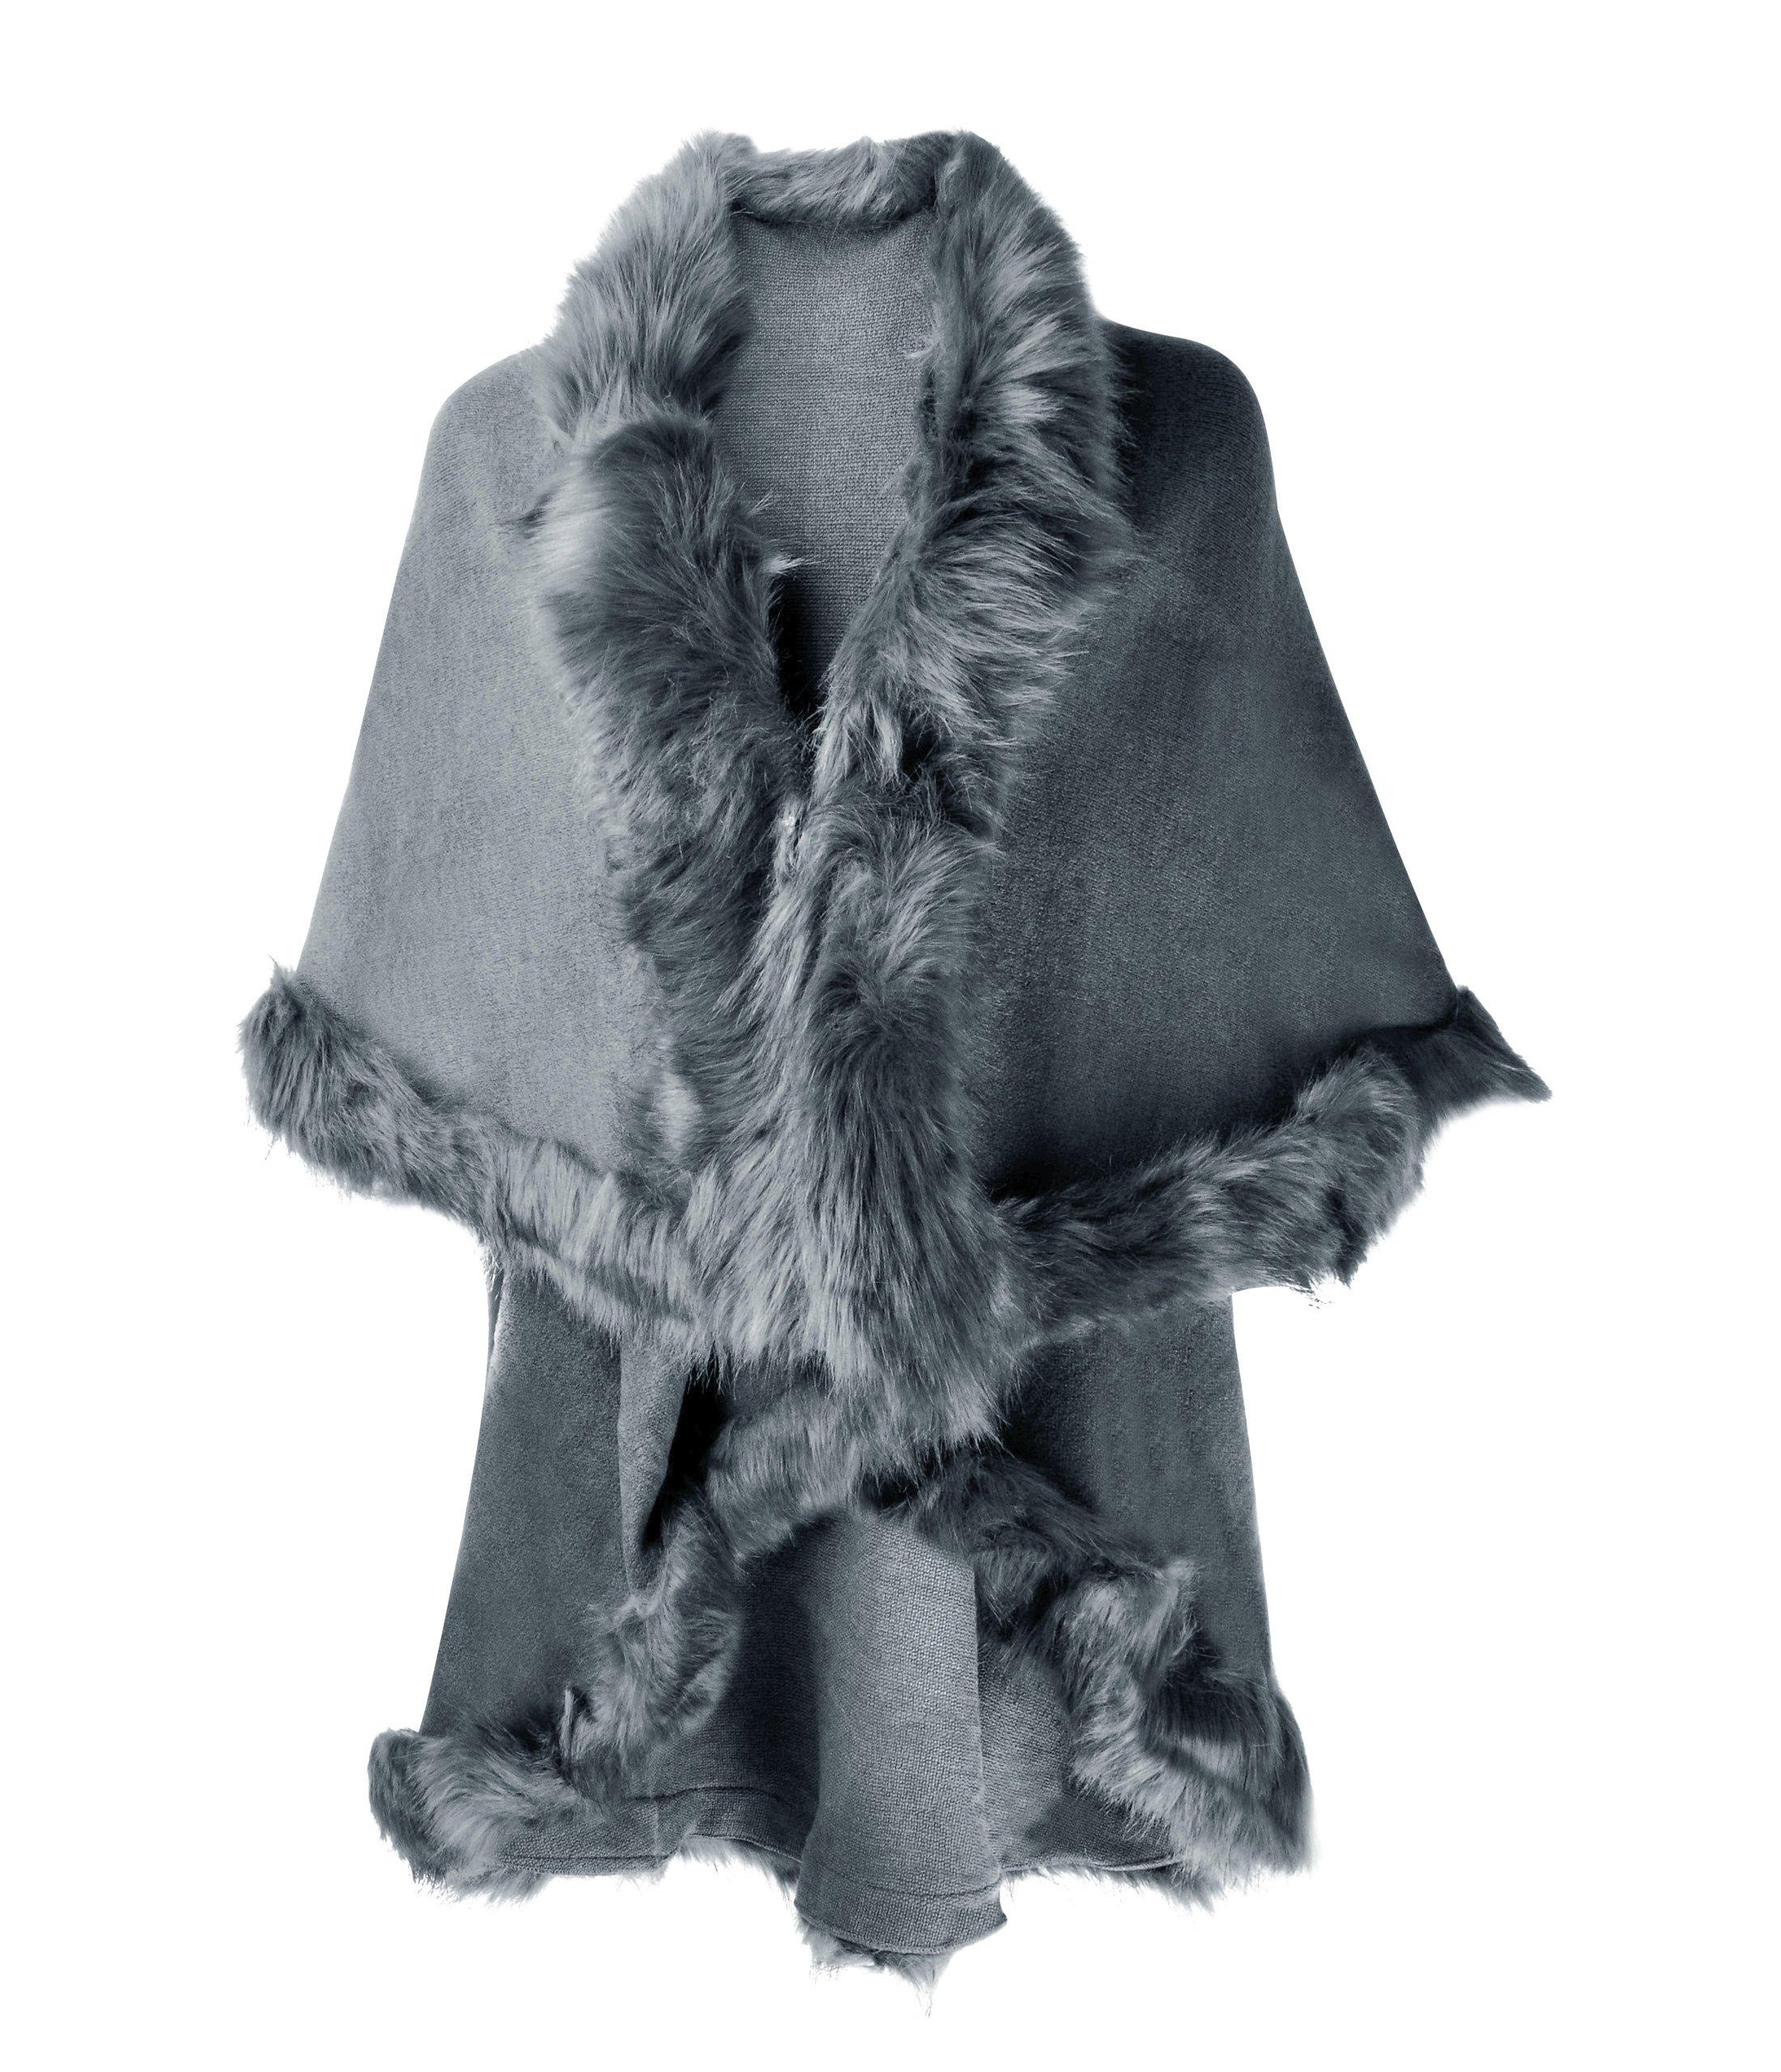 ZLYC Women Fine Knit Open Front Faux Fur Trim Layers Poncho Cape Cardigan Sweater (Gray)